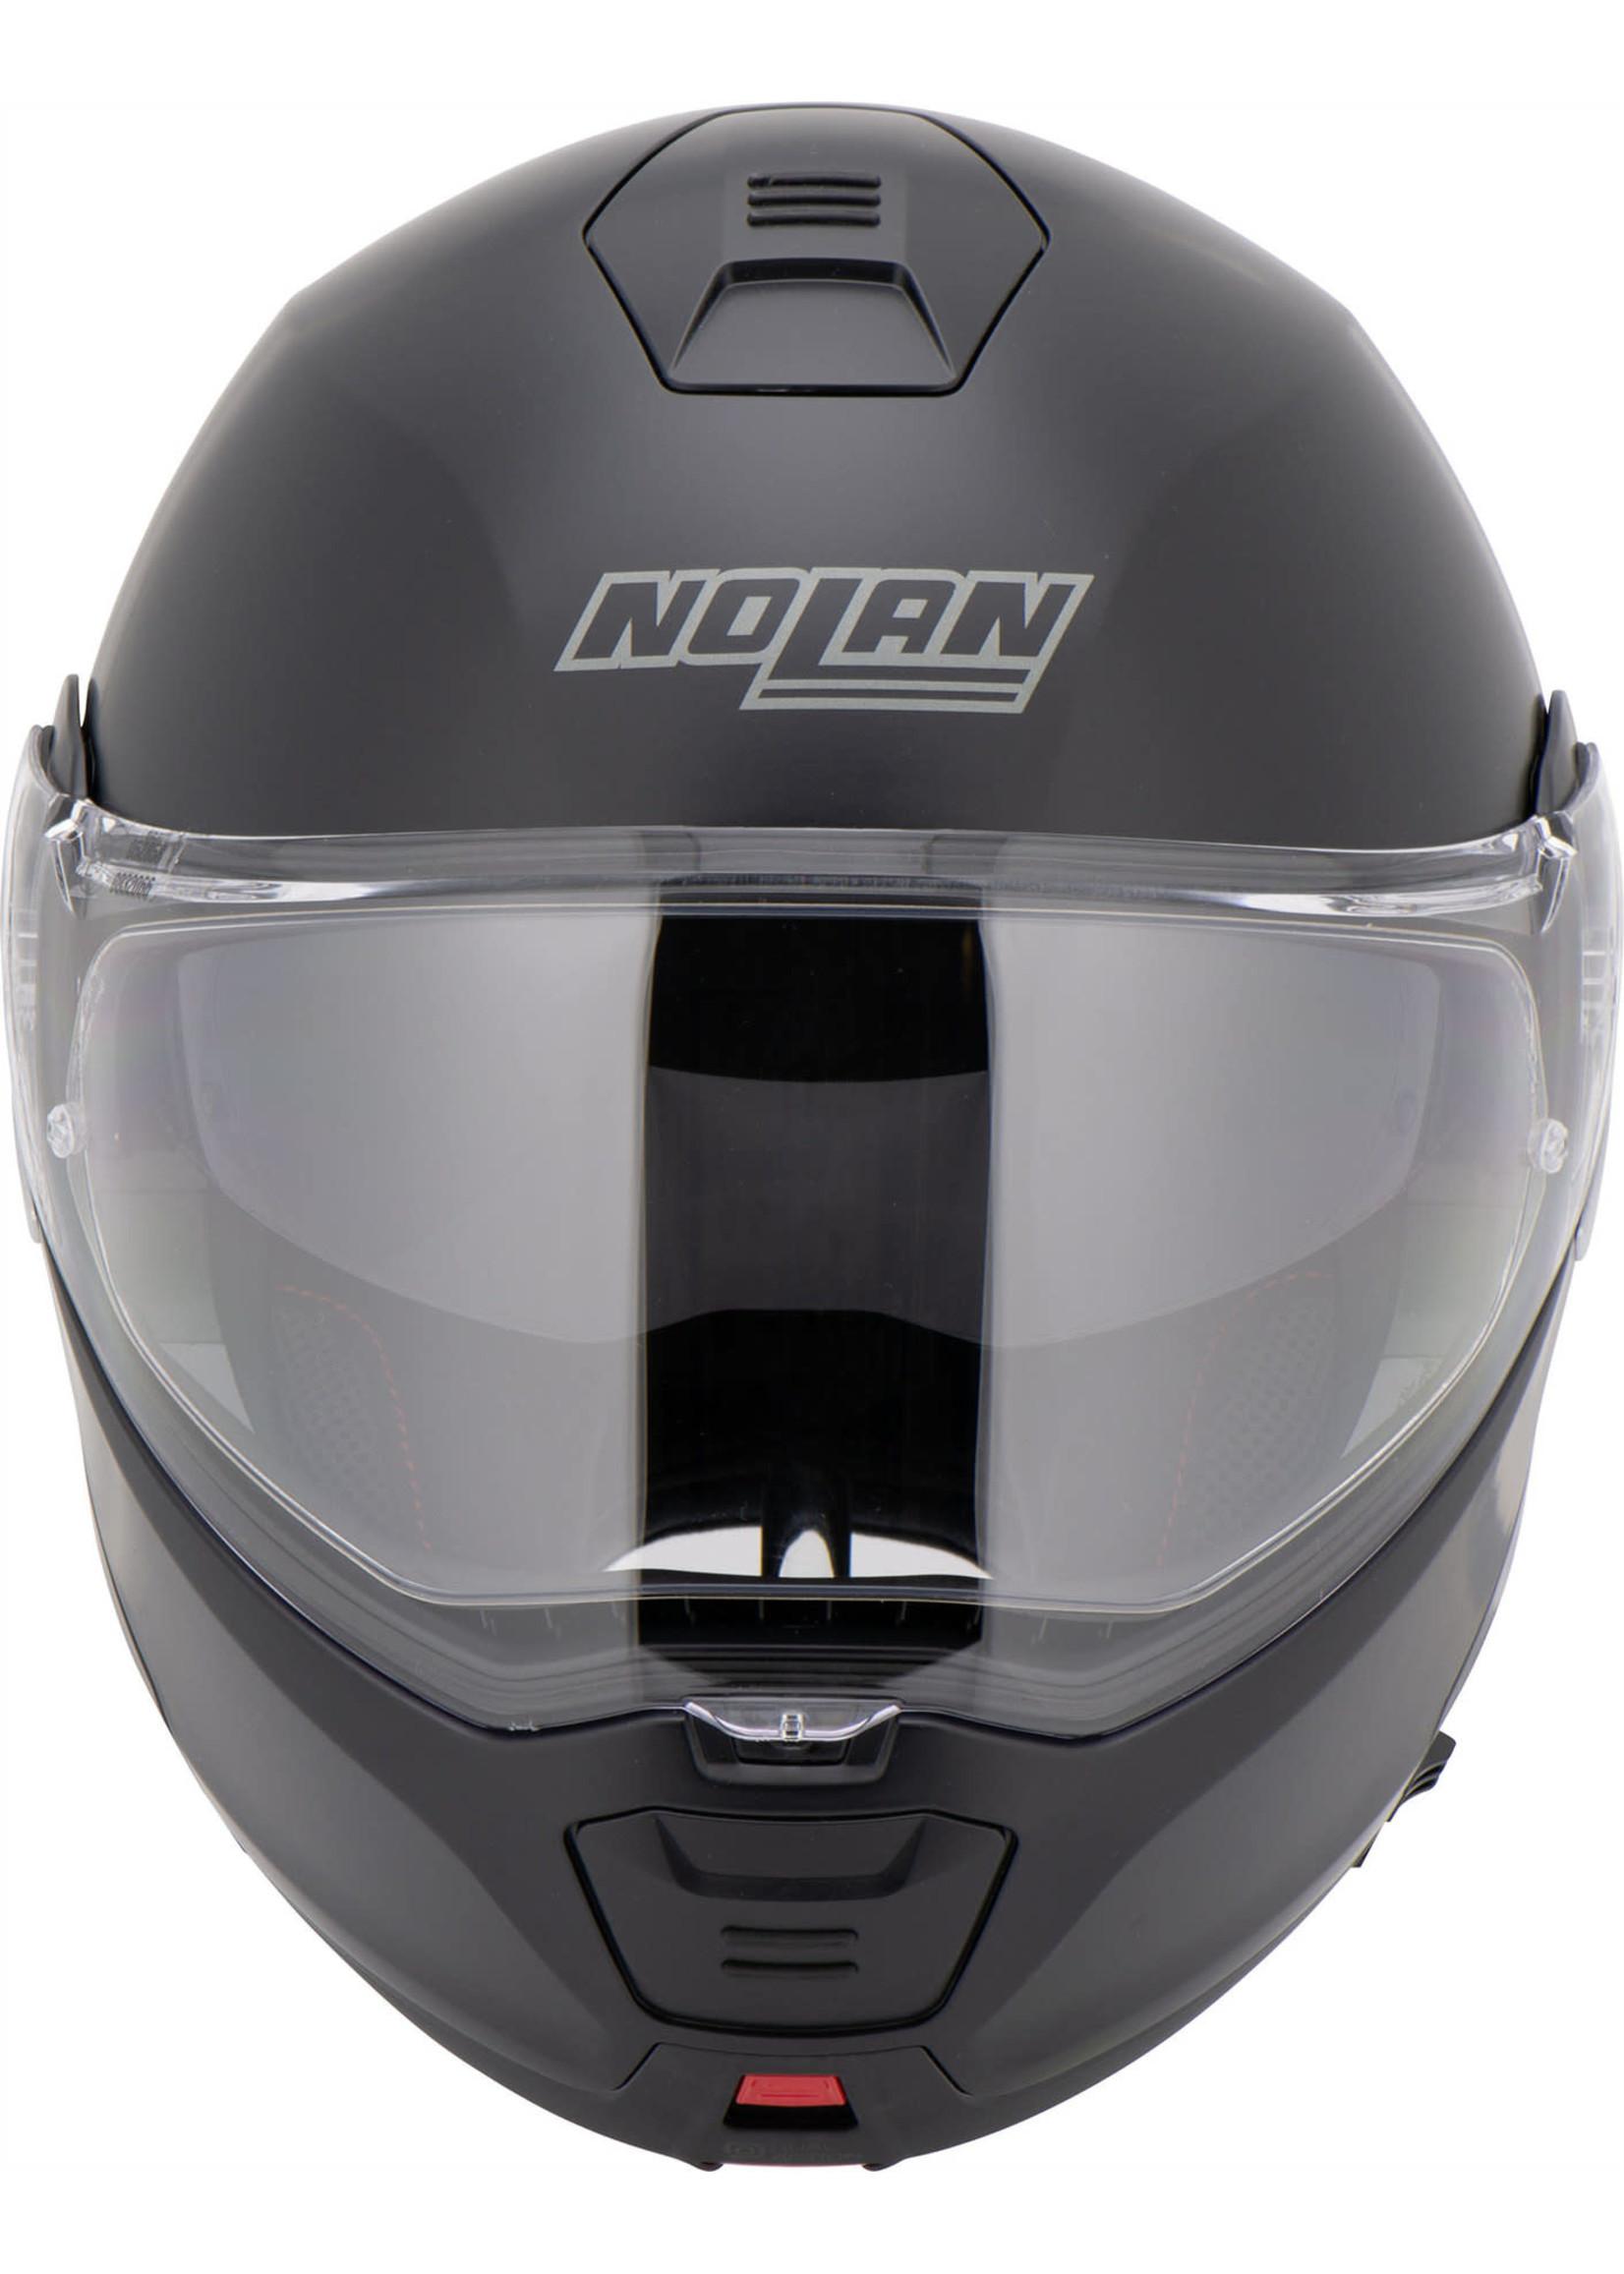 Nolan Nolan N100-5 CLASSIC 010